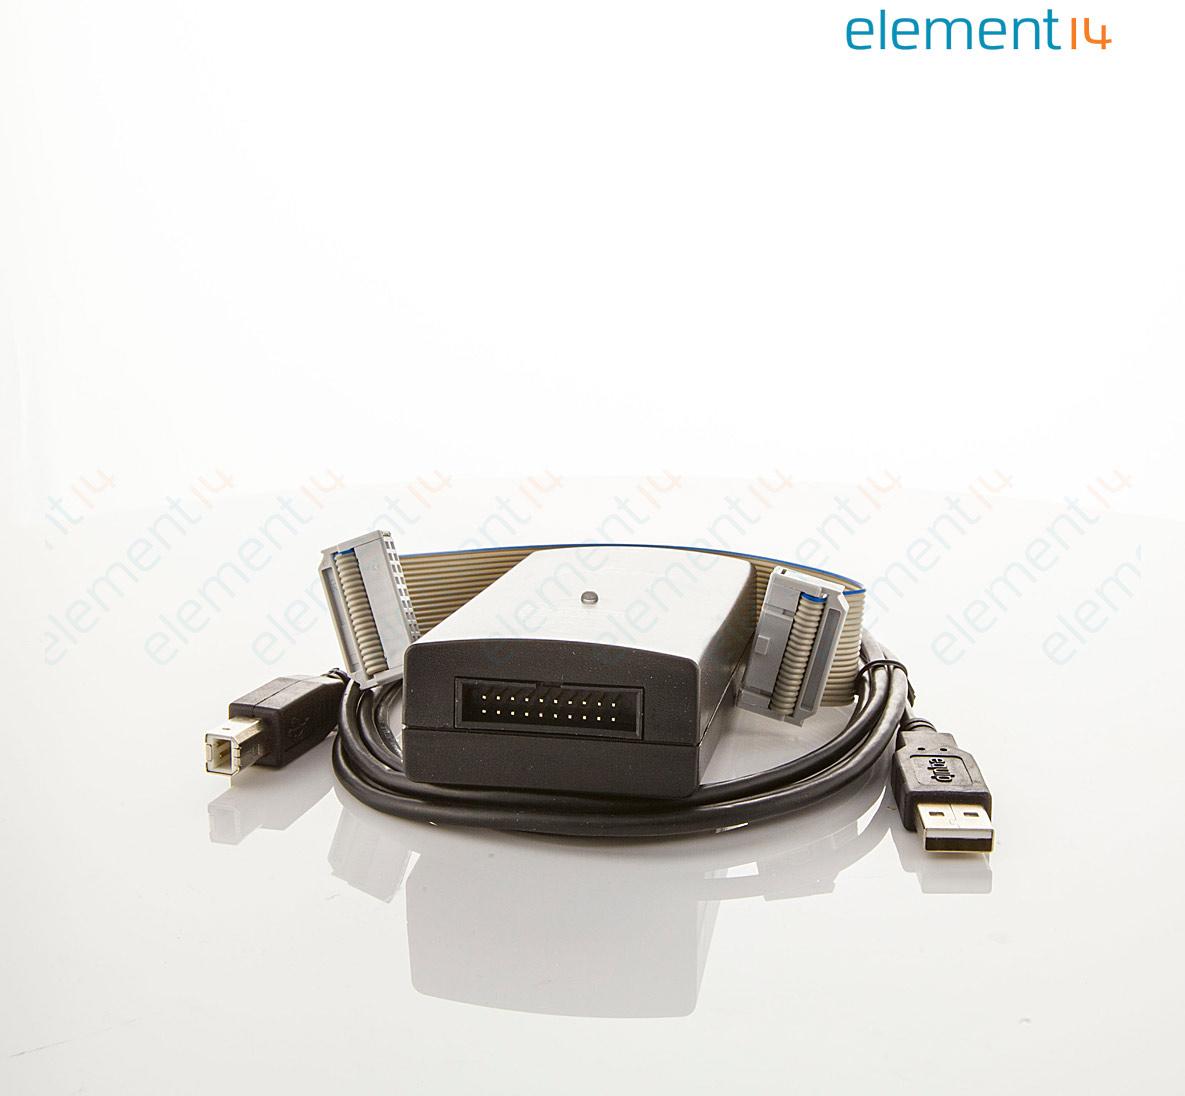 USB JTAG Emulator, Supports ARM, Cortex-M, Cortex-A, RX000 Series &  Cortex-R4 MCUs, USB Interface